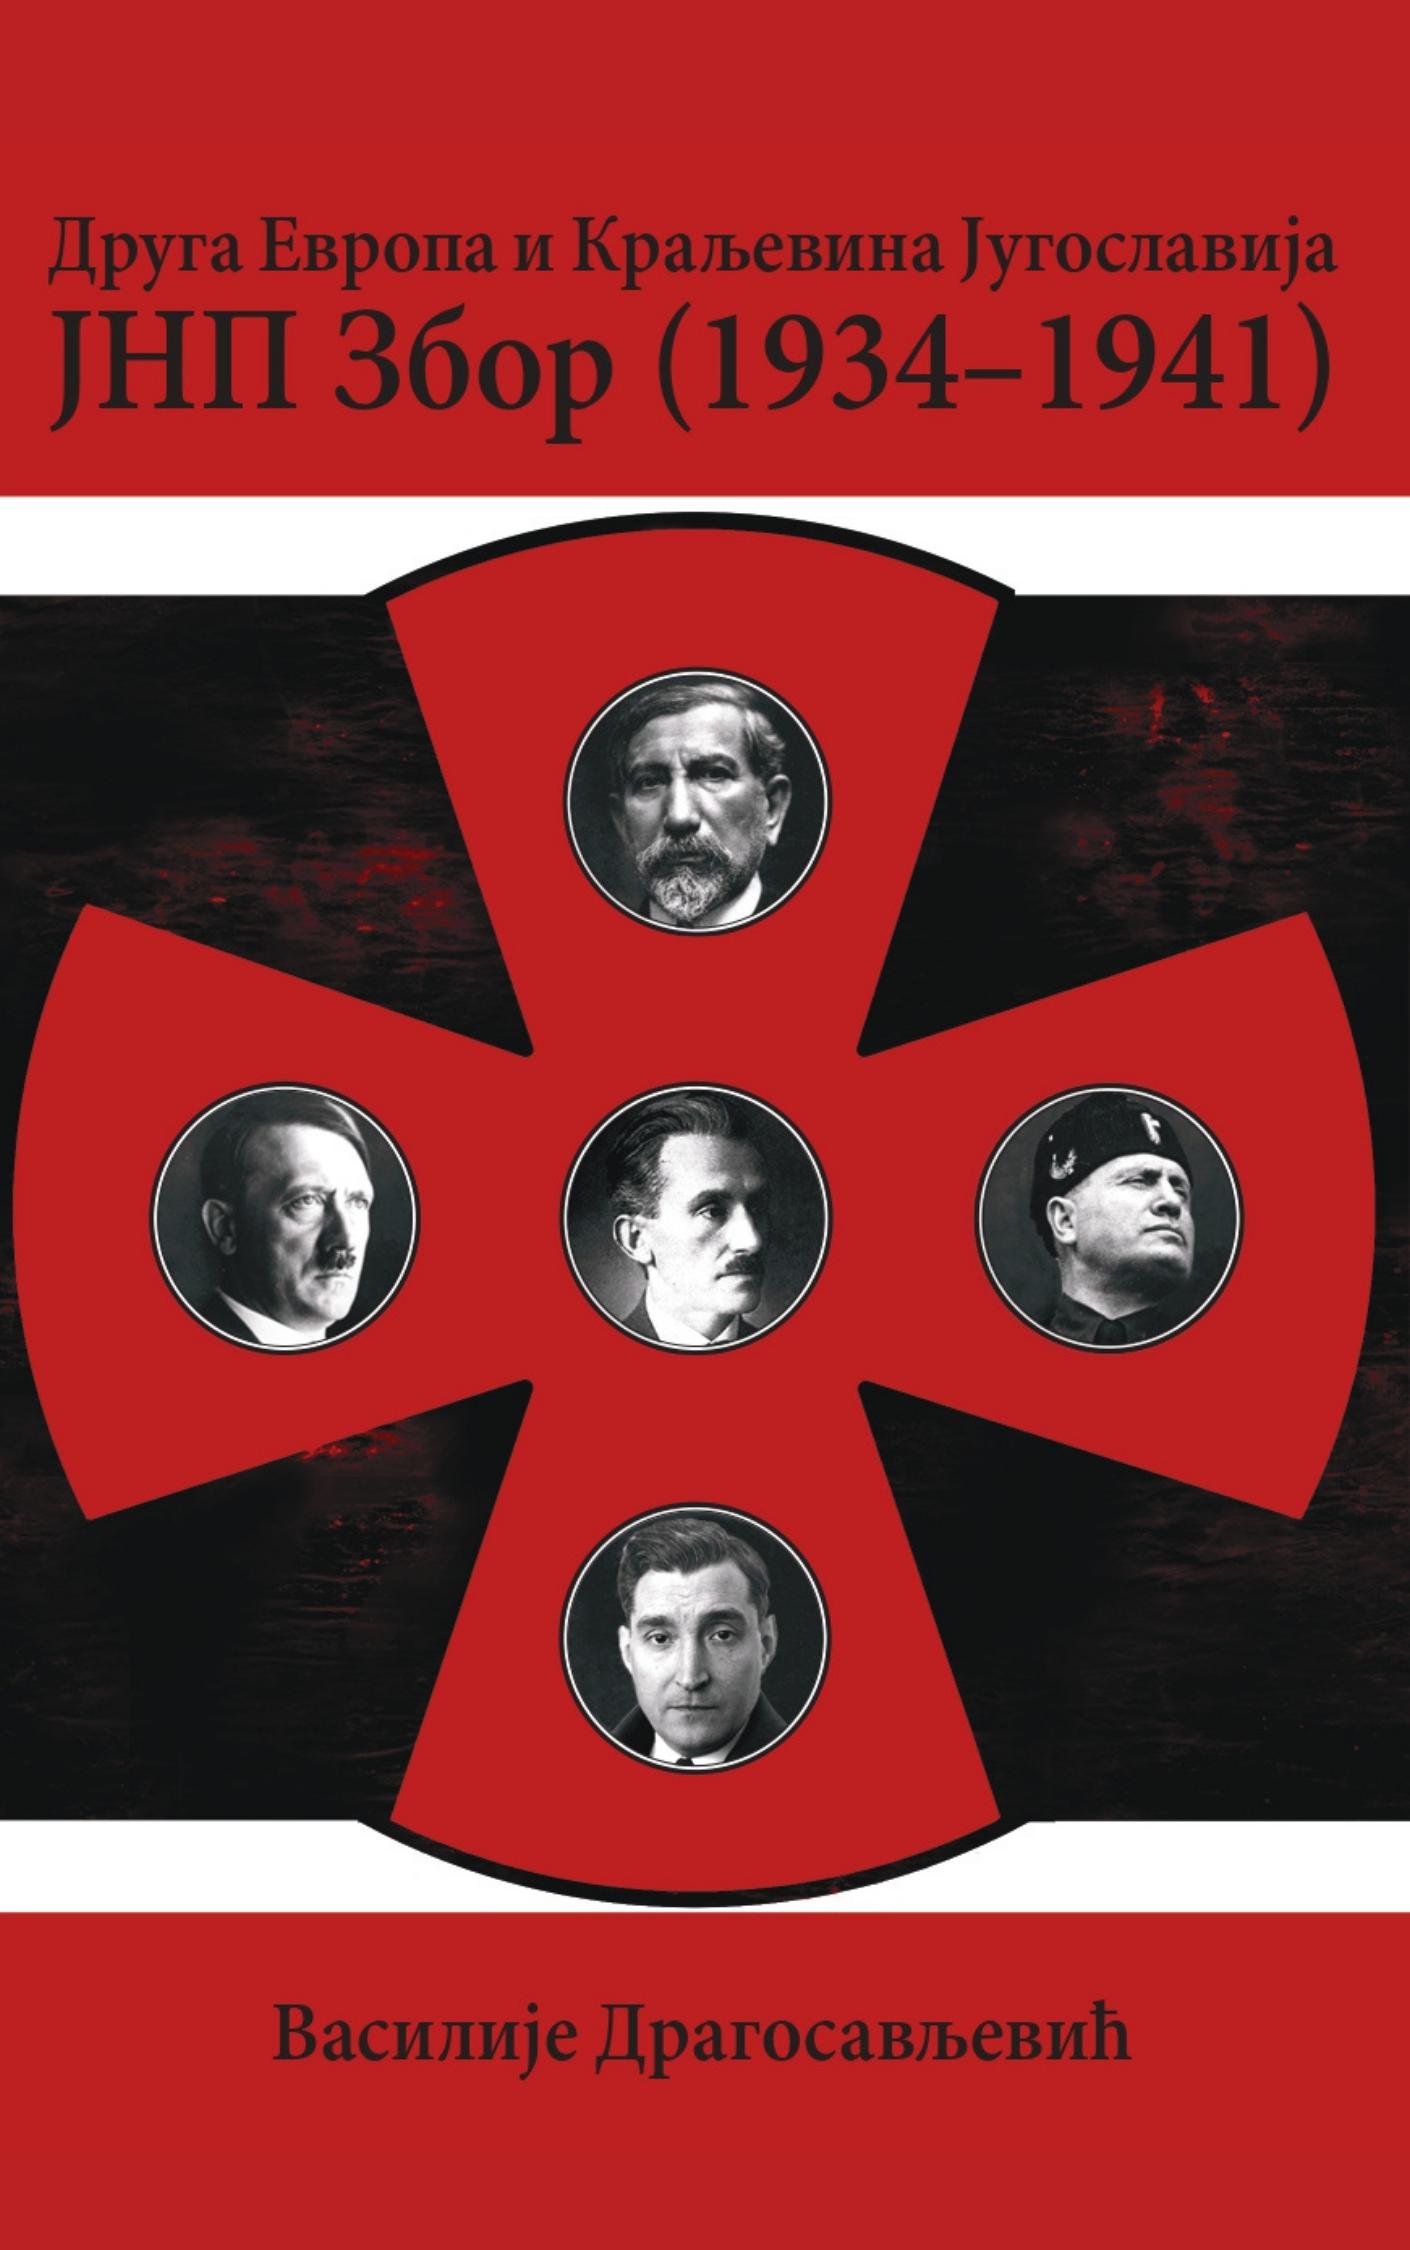 Друга Европа и Краљевина Југославија – ЈНП Збор (1934–1941)